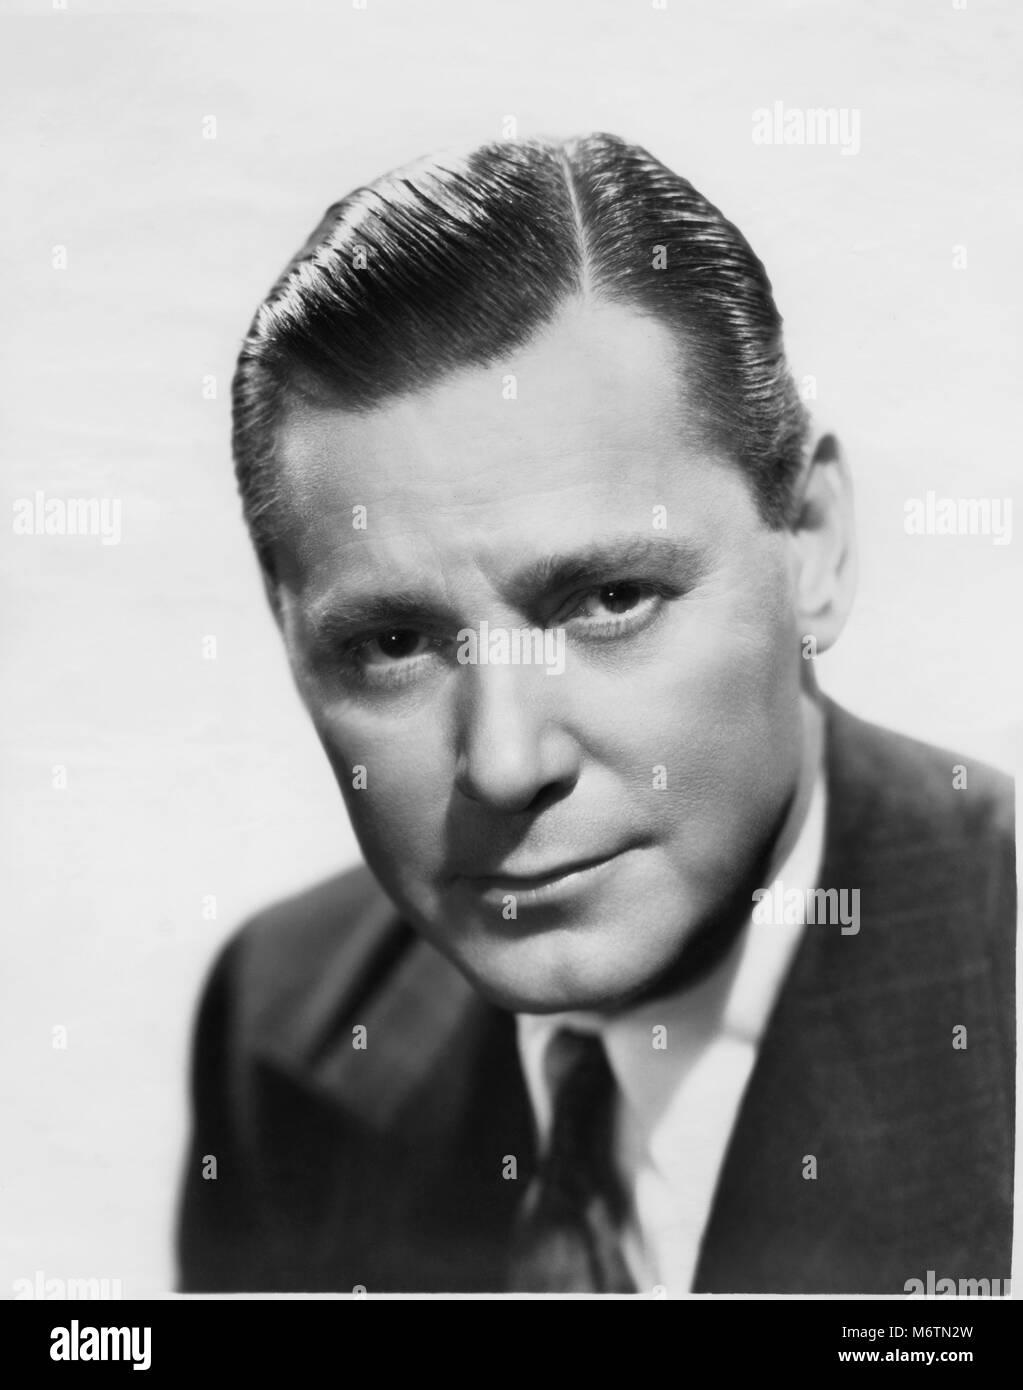 Herbert Marshall, Publicity Portrait for the Film, 'Always Goodbye', 20th Century Fox, 1938 - Stock Image